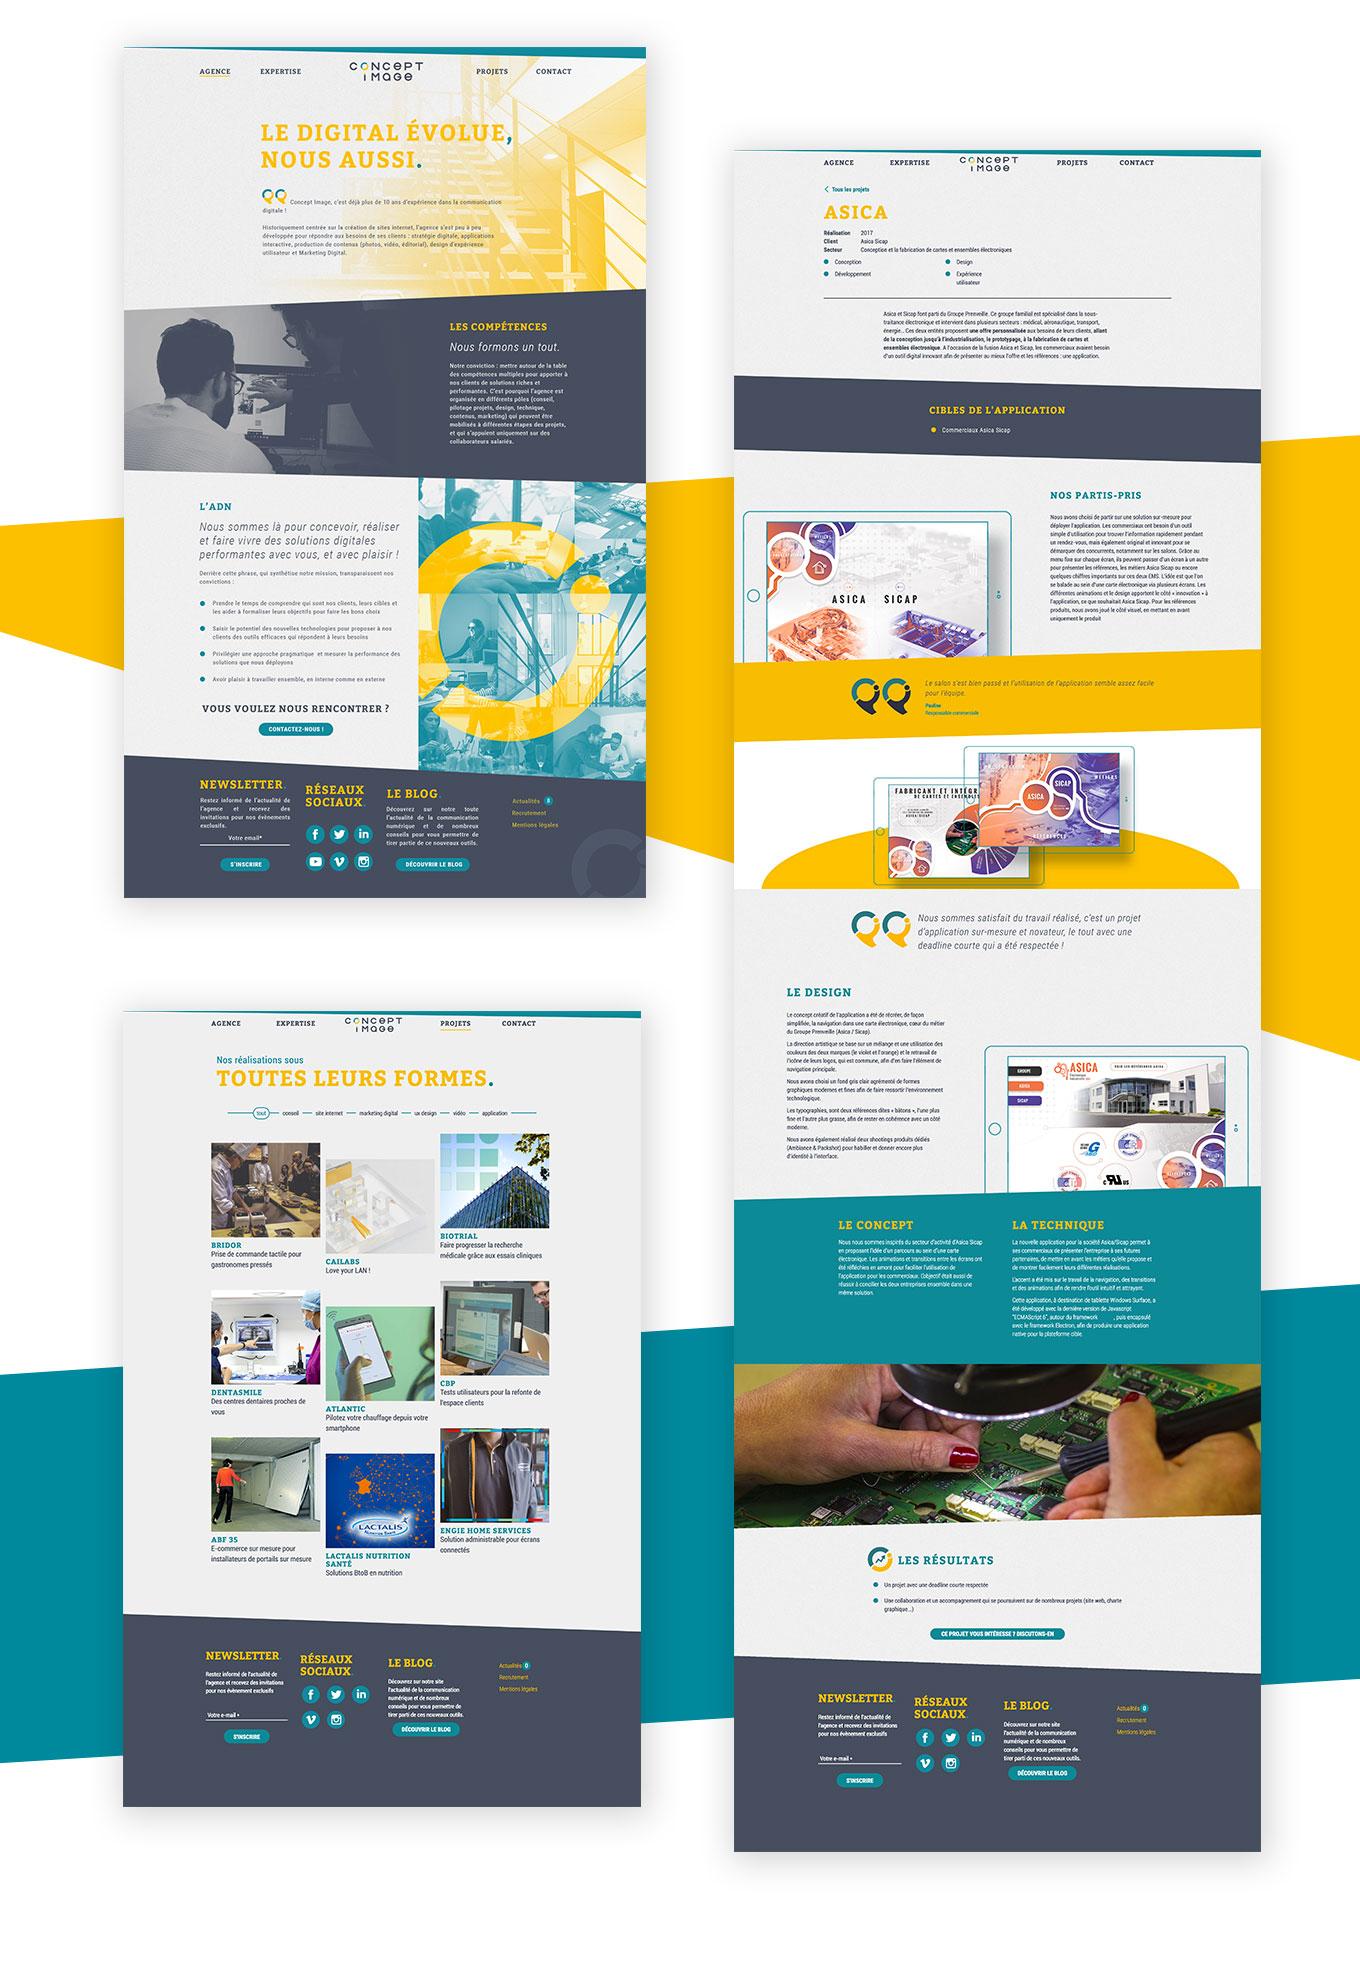 webdesign-concept-image-flowhynot-2